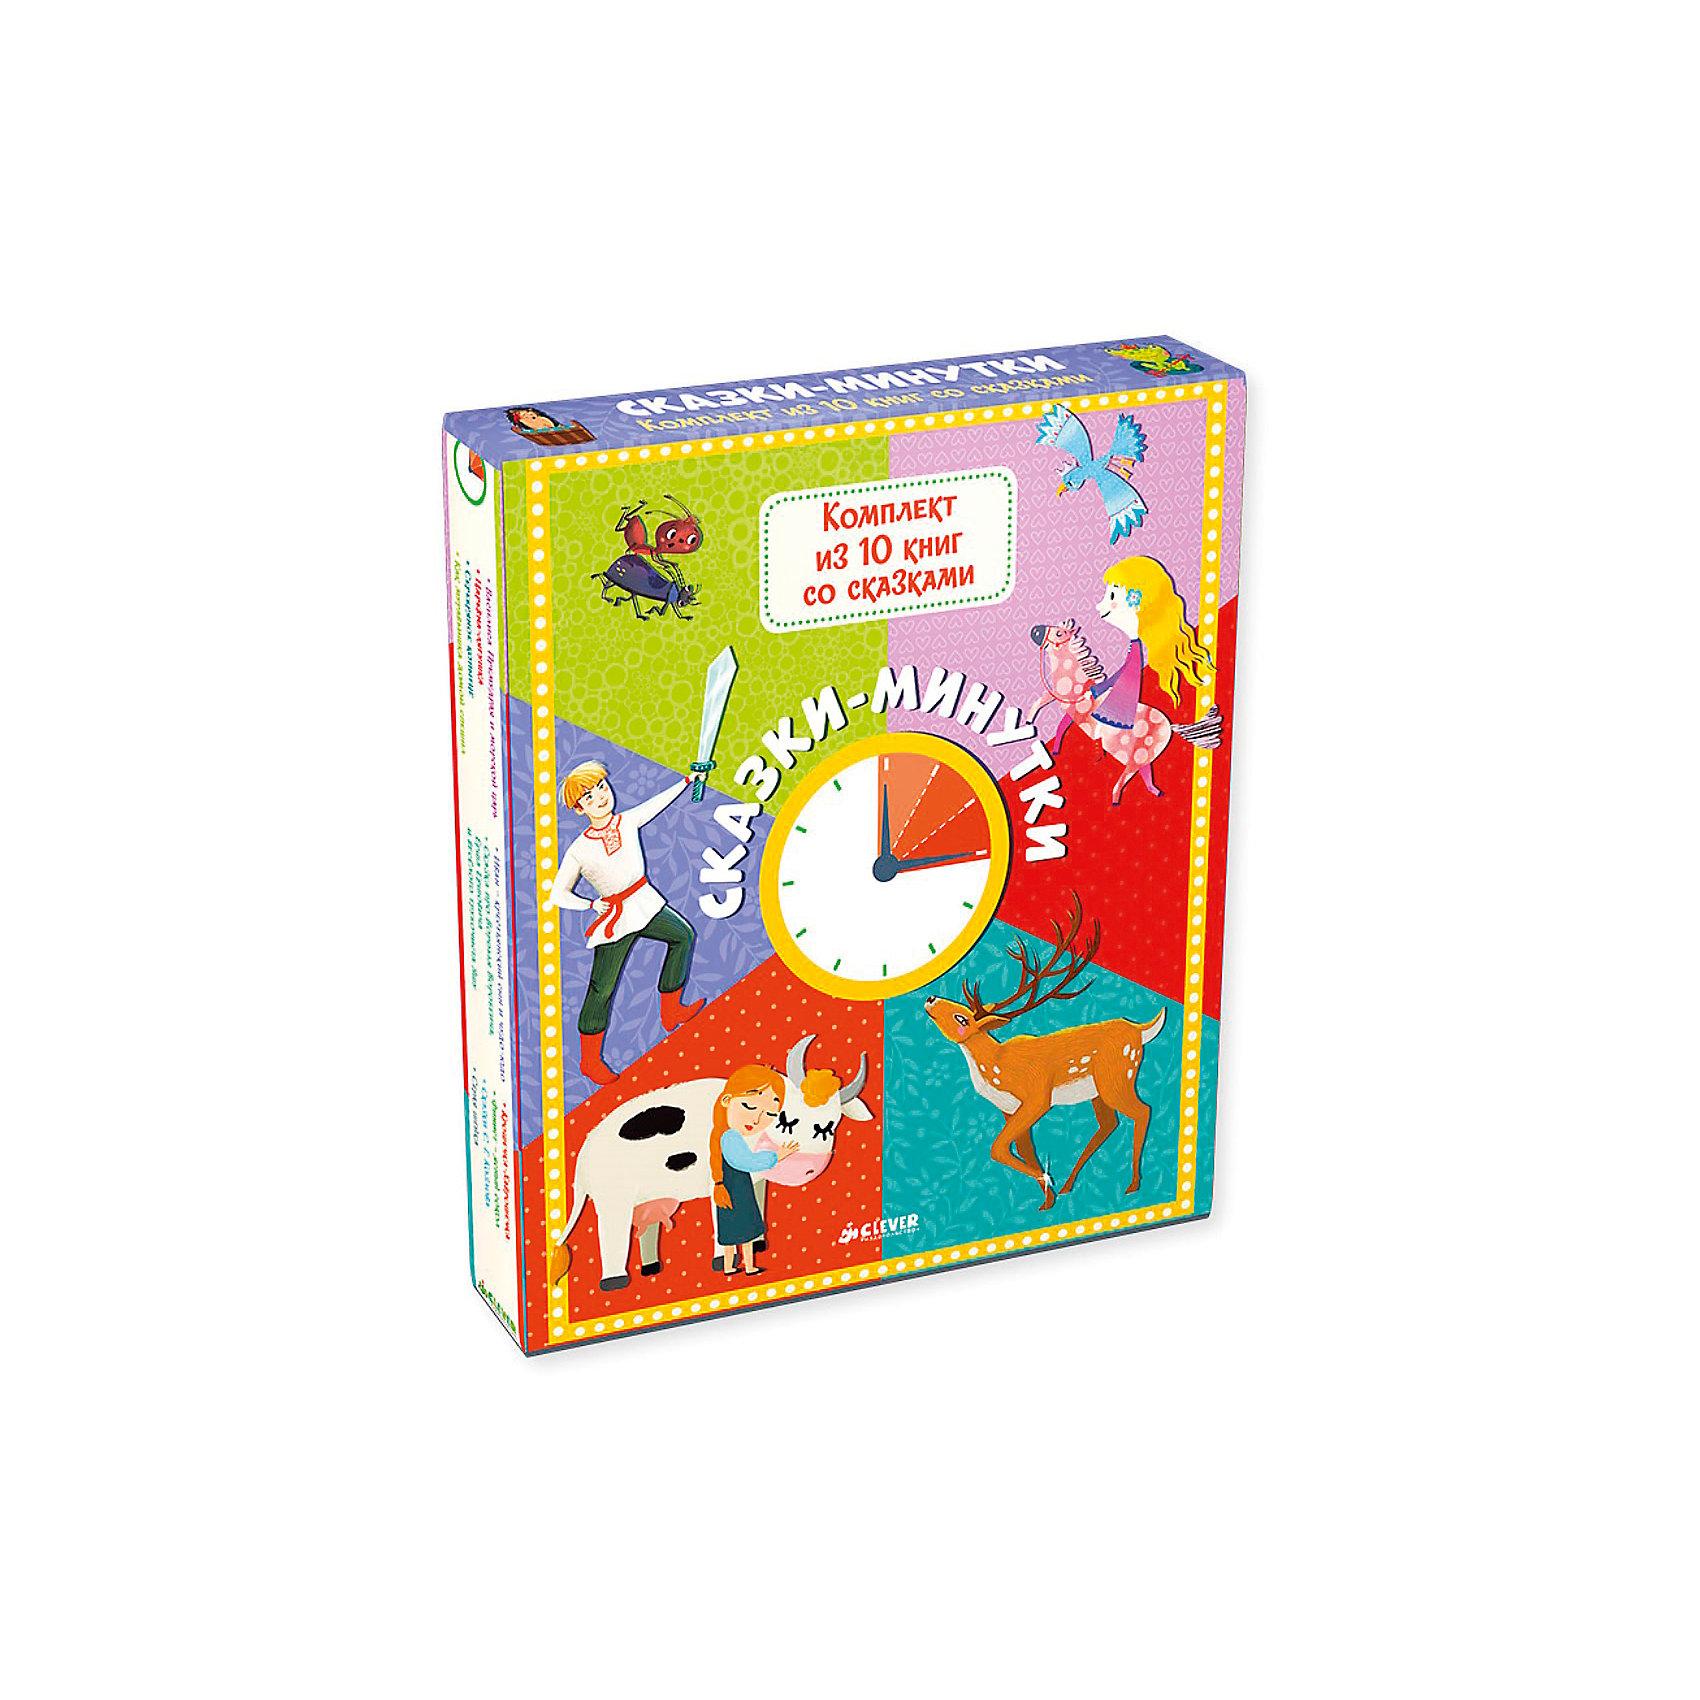 Clever Комплект Сказки-минутки (10 книг) раннее развитие clever набор для девочки скоро в школу комплект из 5 книг